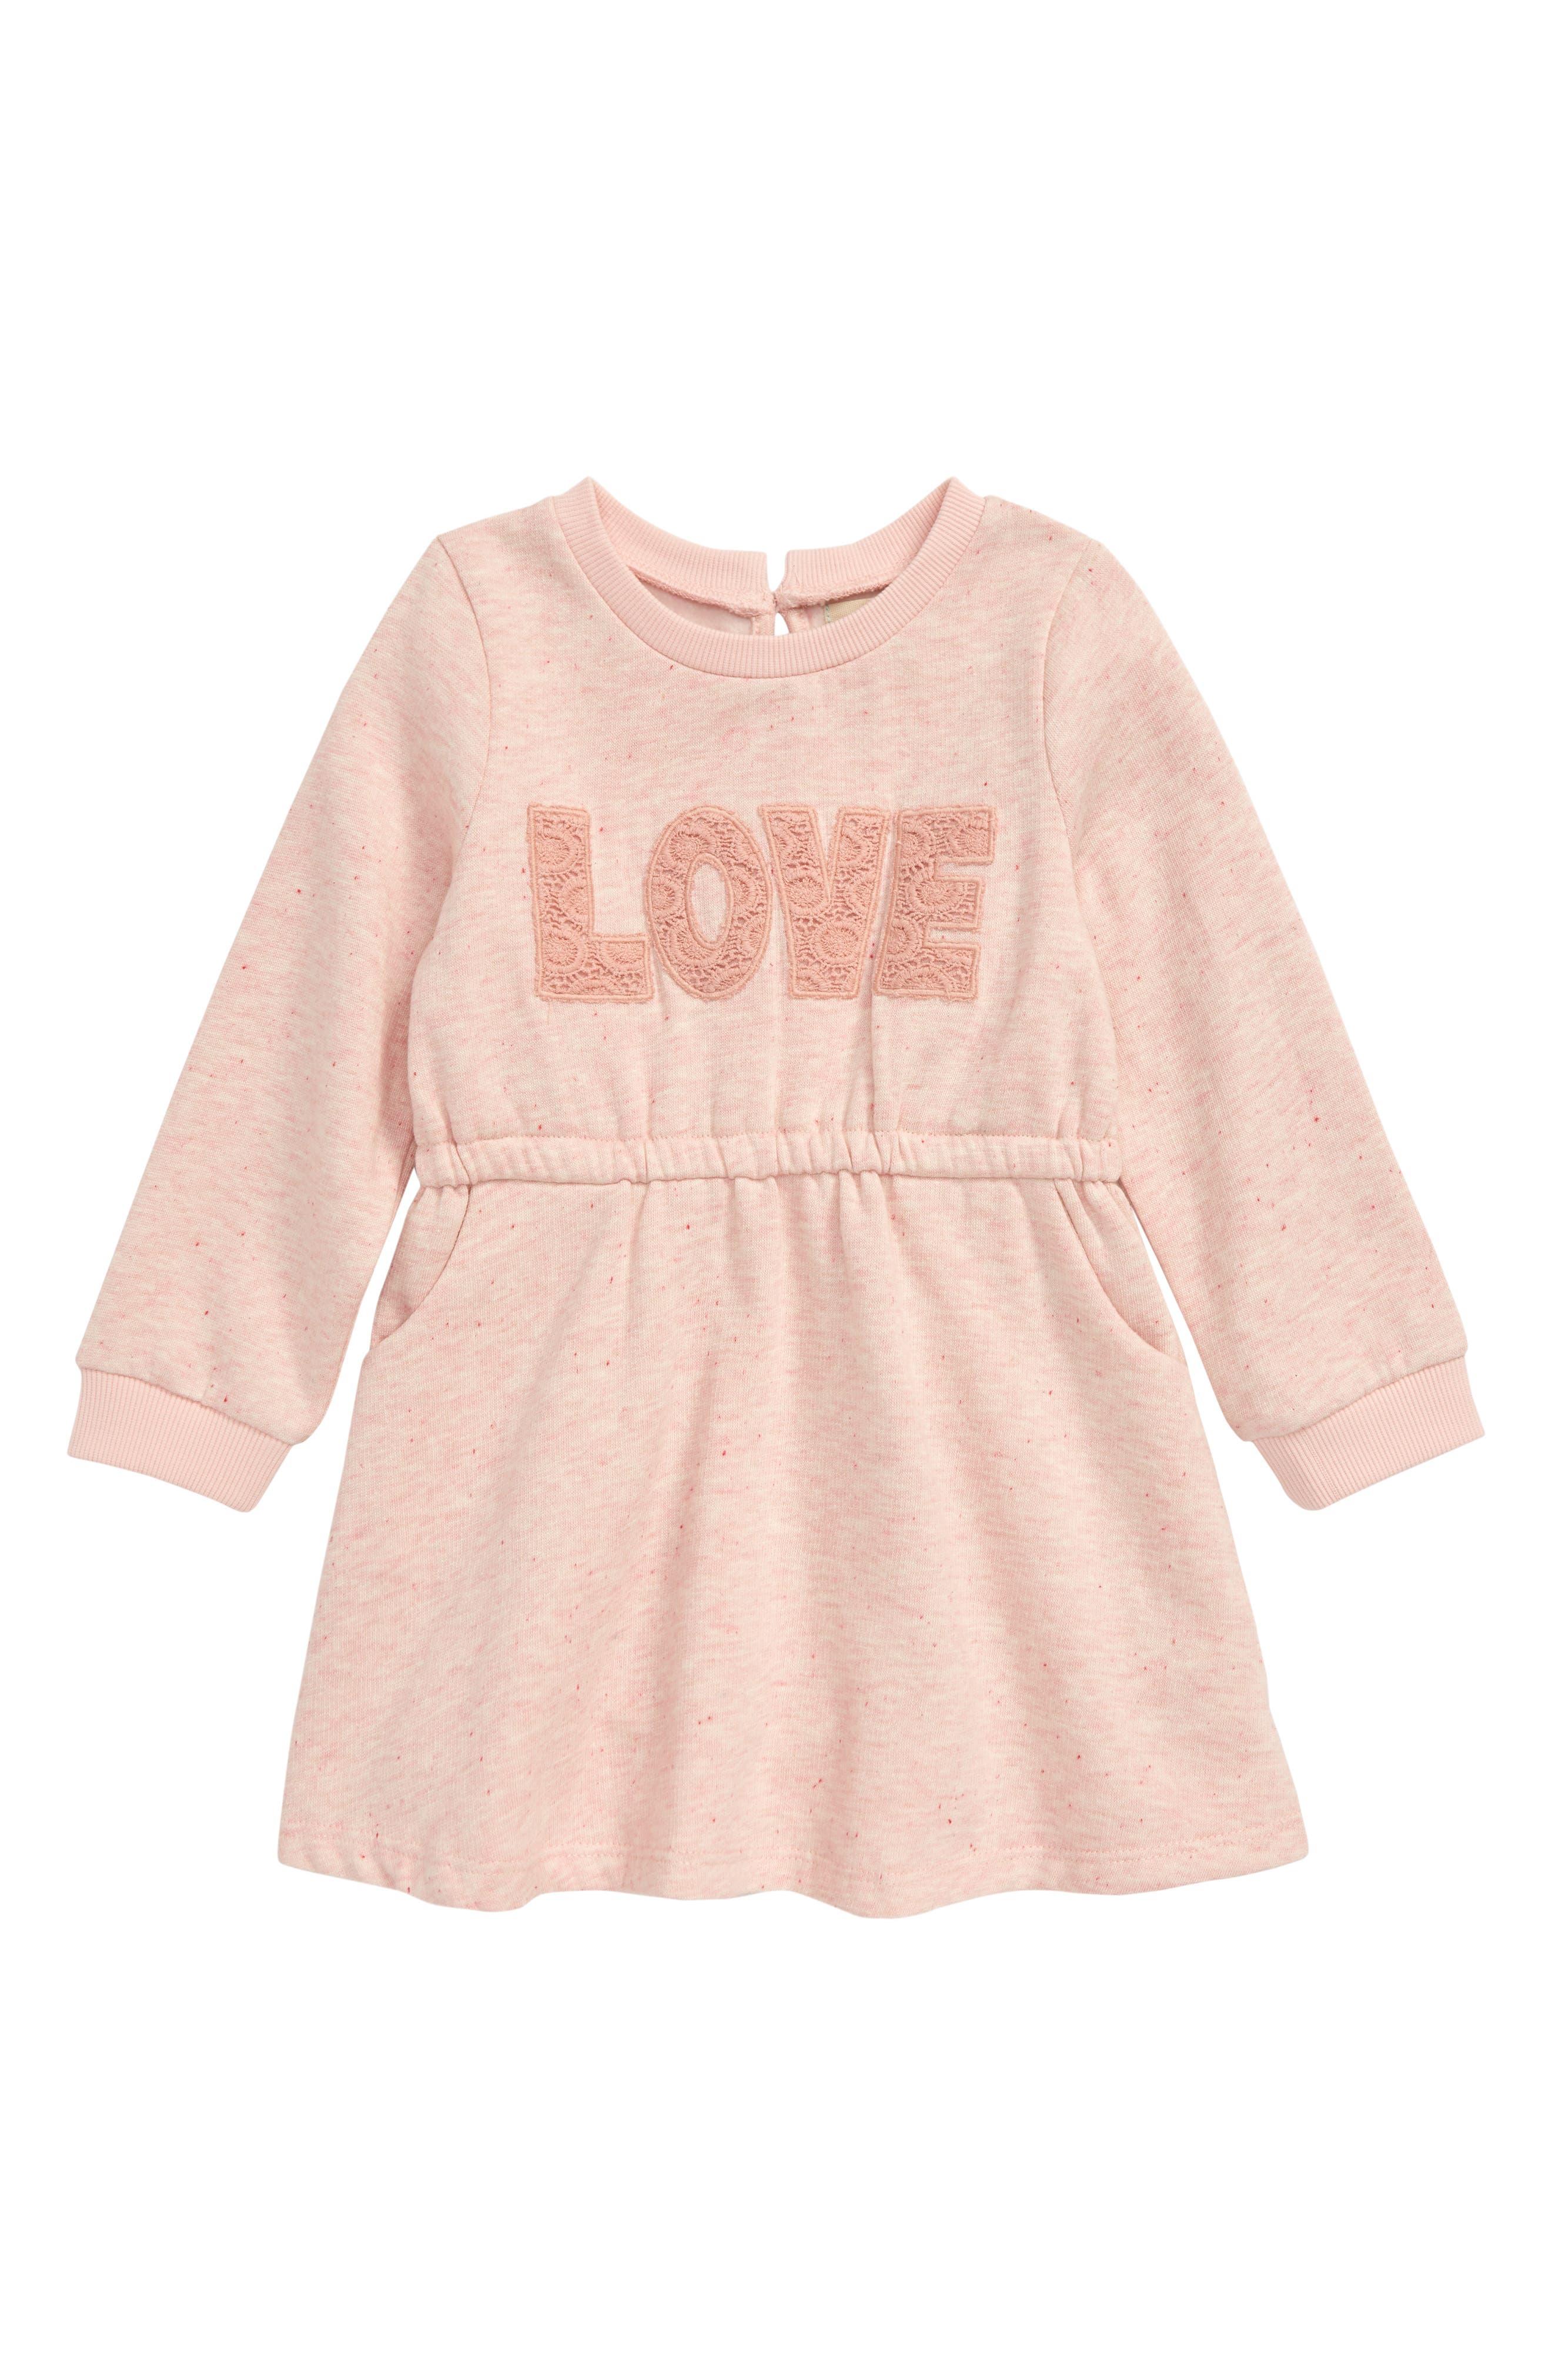 Image of PEEK ESSENTIALS Love Embroidered Sweatshirt Dress